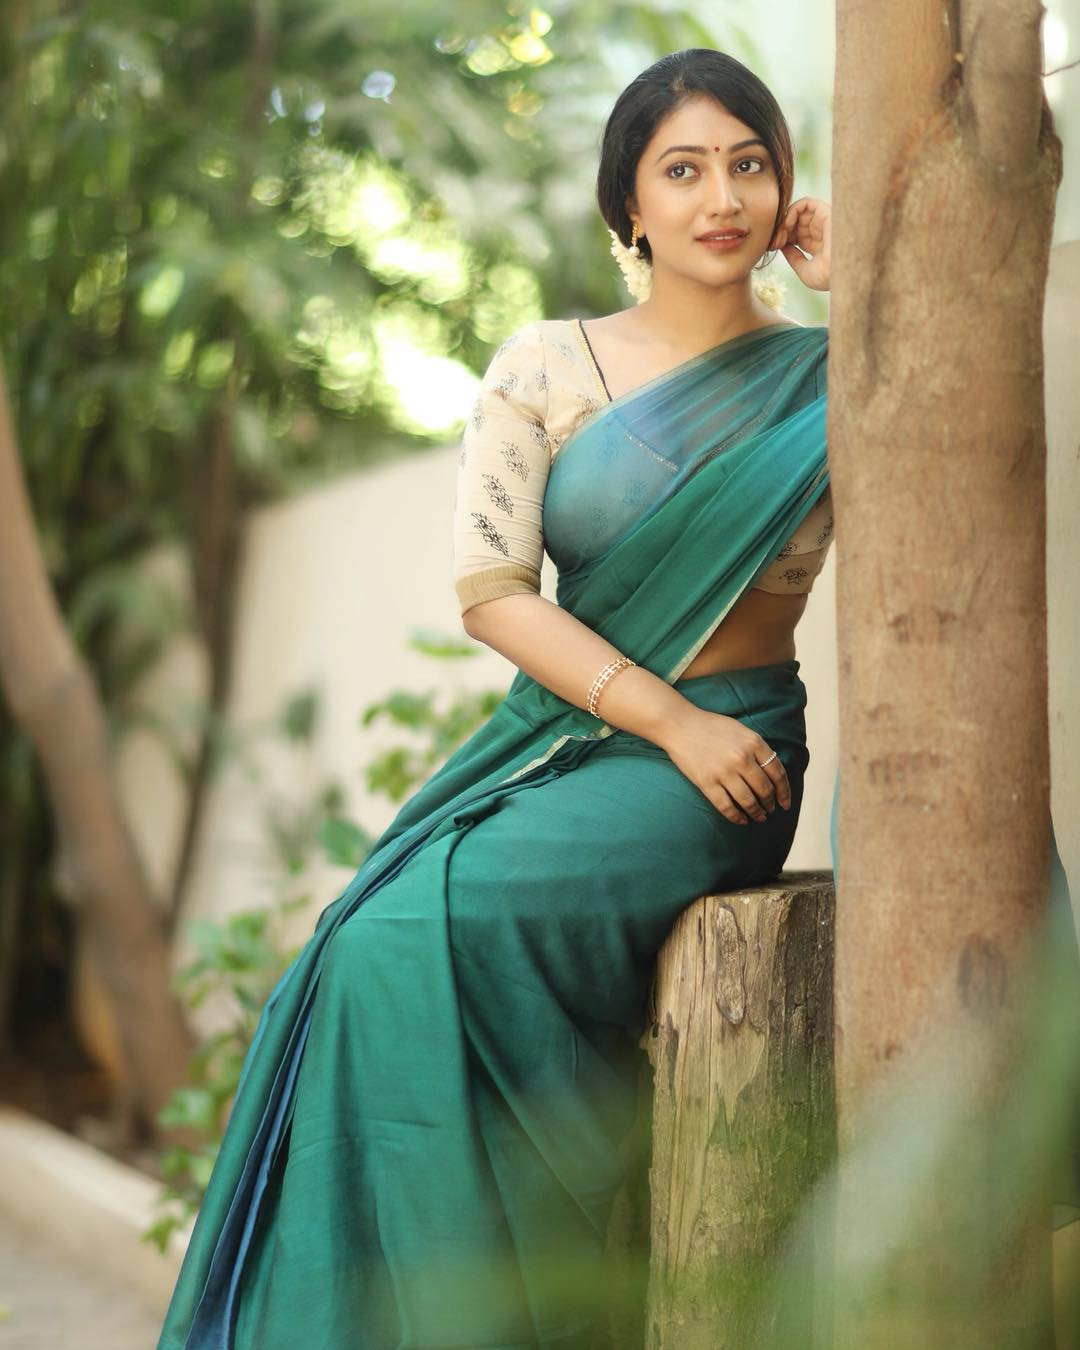 Bommu Lakshmi photos (25)